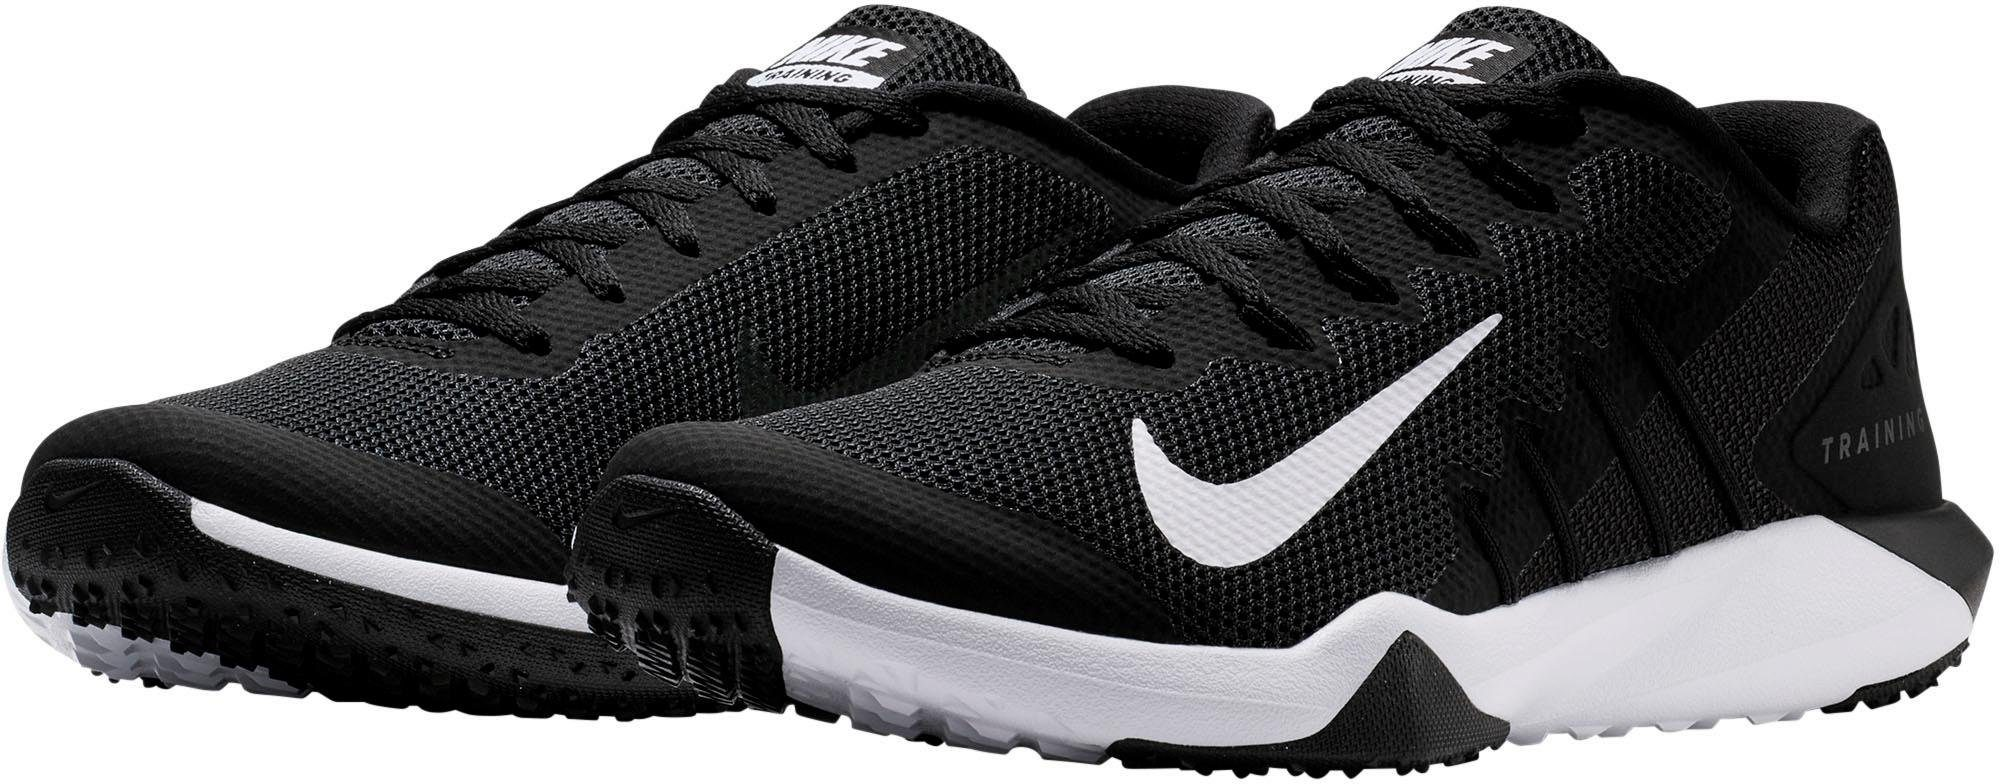 Nike »Retaliation Trainer 2« Trainingsschuh kaufen   OTTO